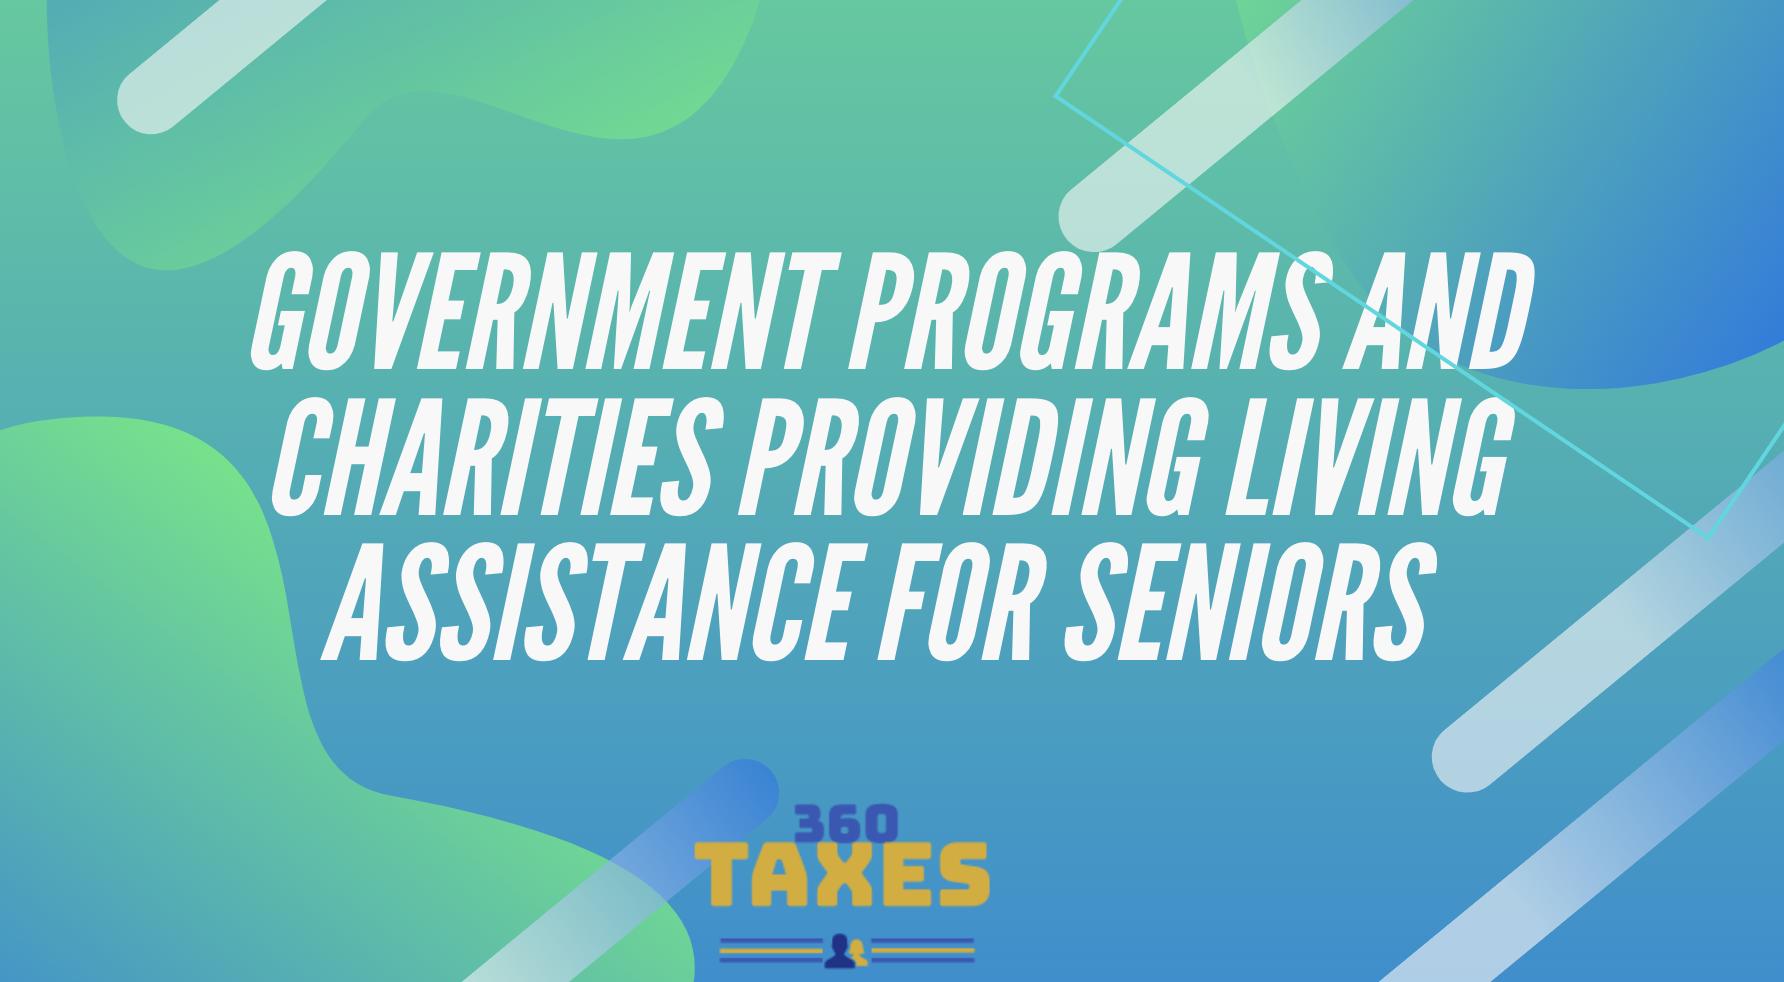 living assistance for seniors